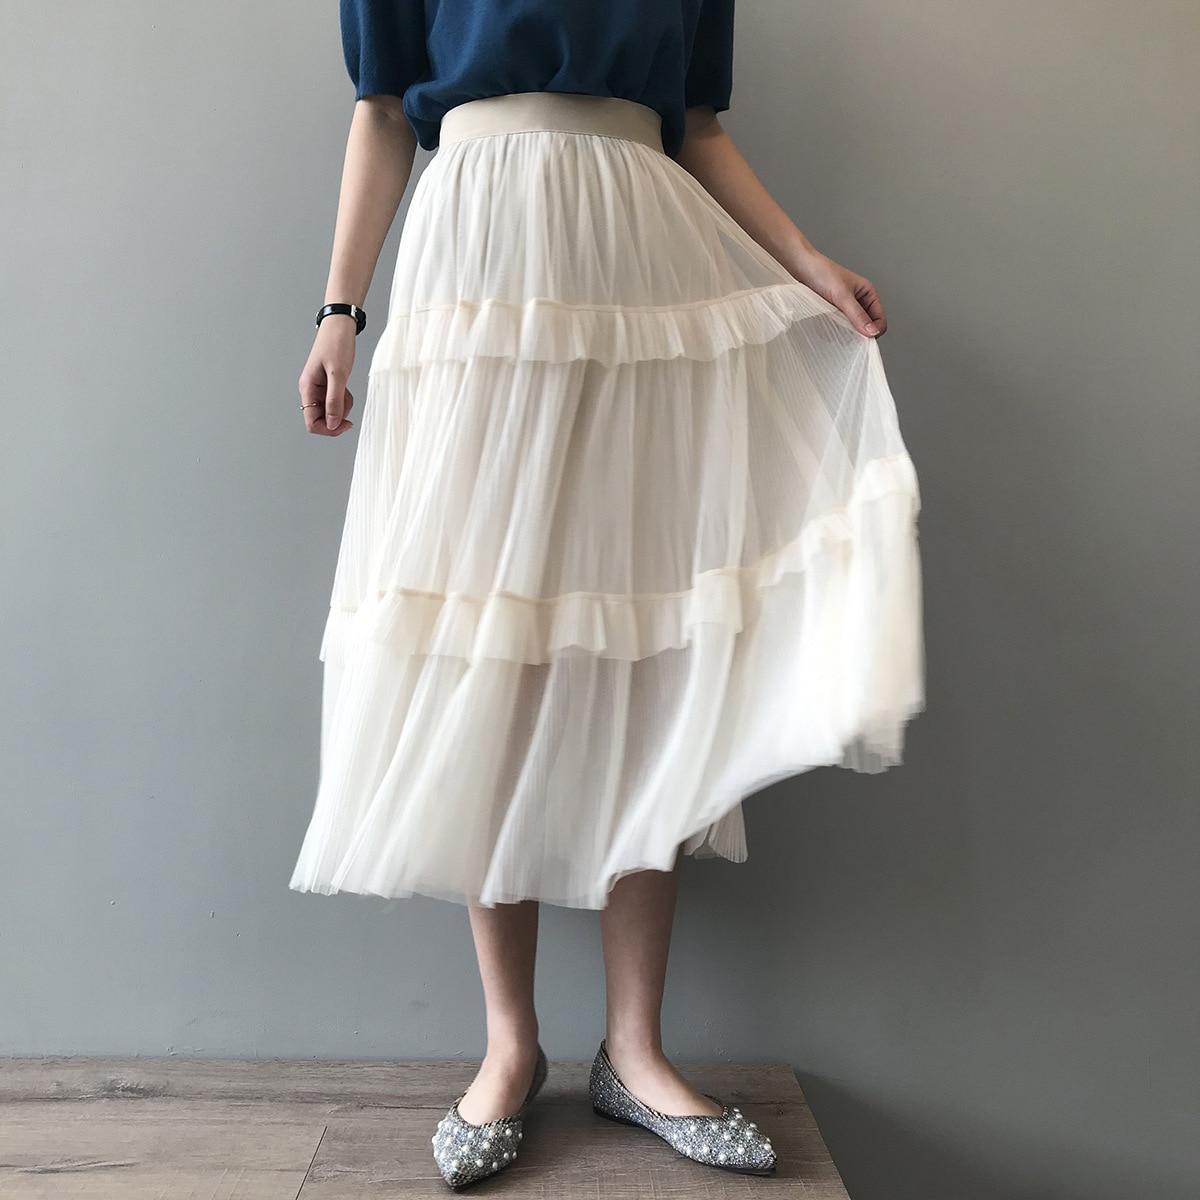 Sherhure 2020 Women Summer High Waist Skirts Vintage Women Ruffles White Mesh Long Skirt Faldas Jupe Femme Saia